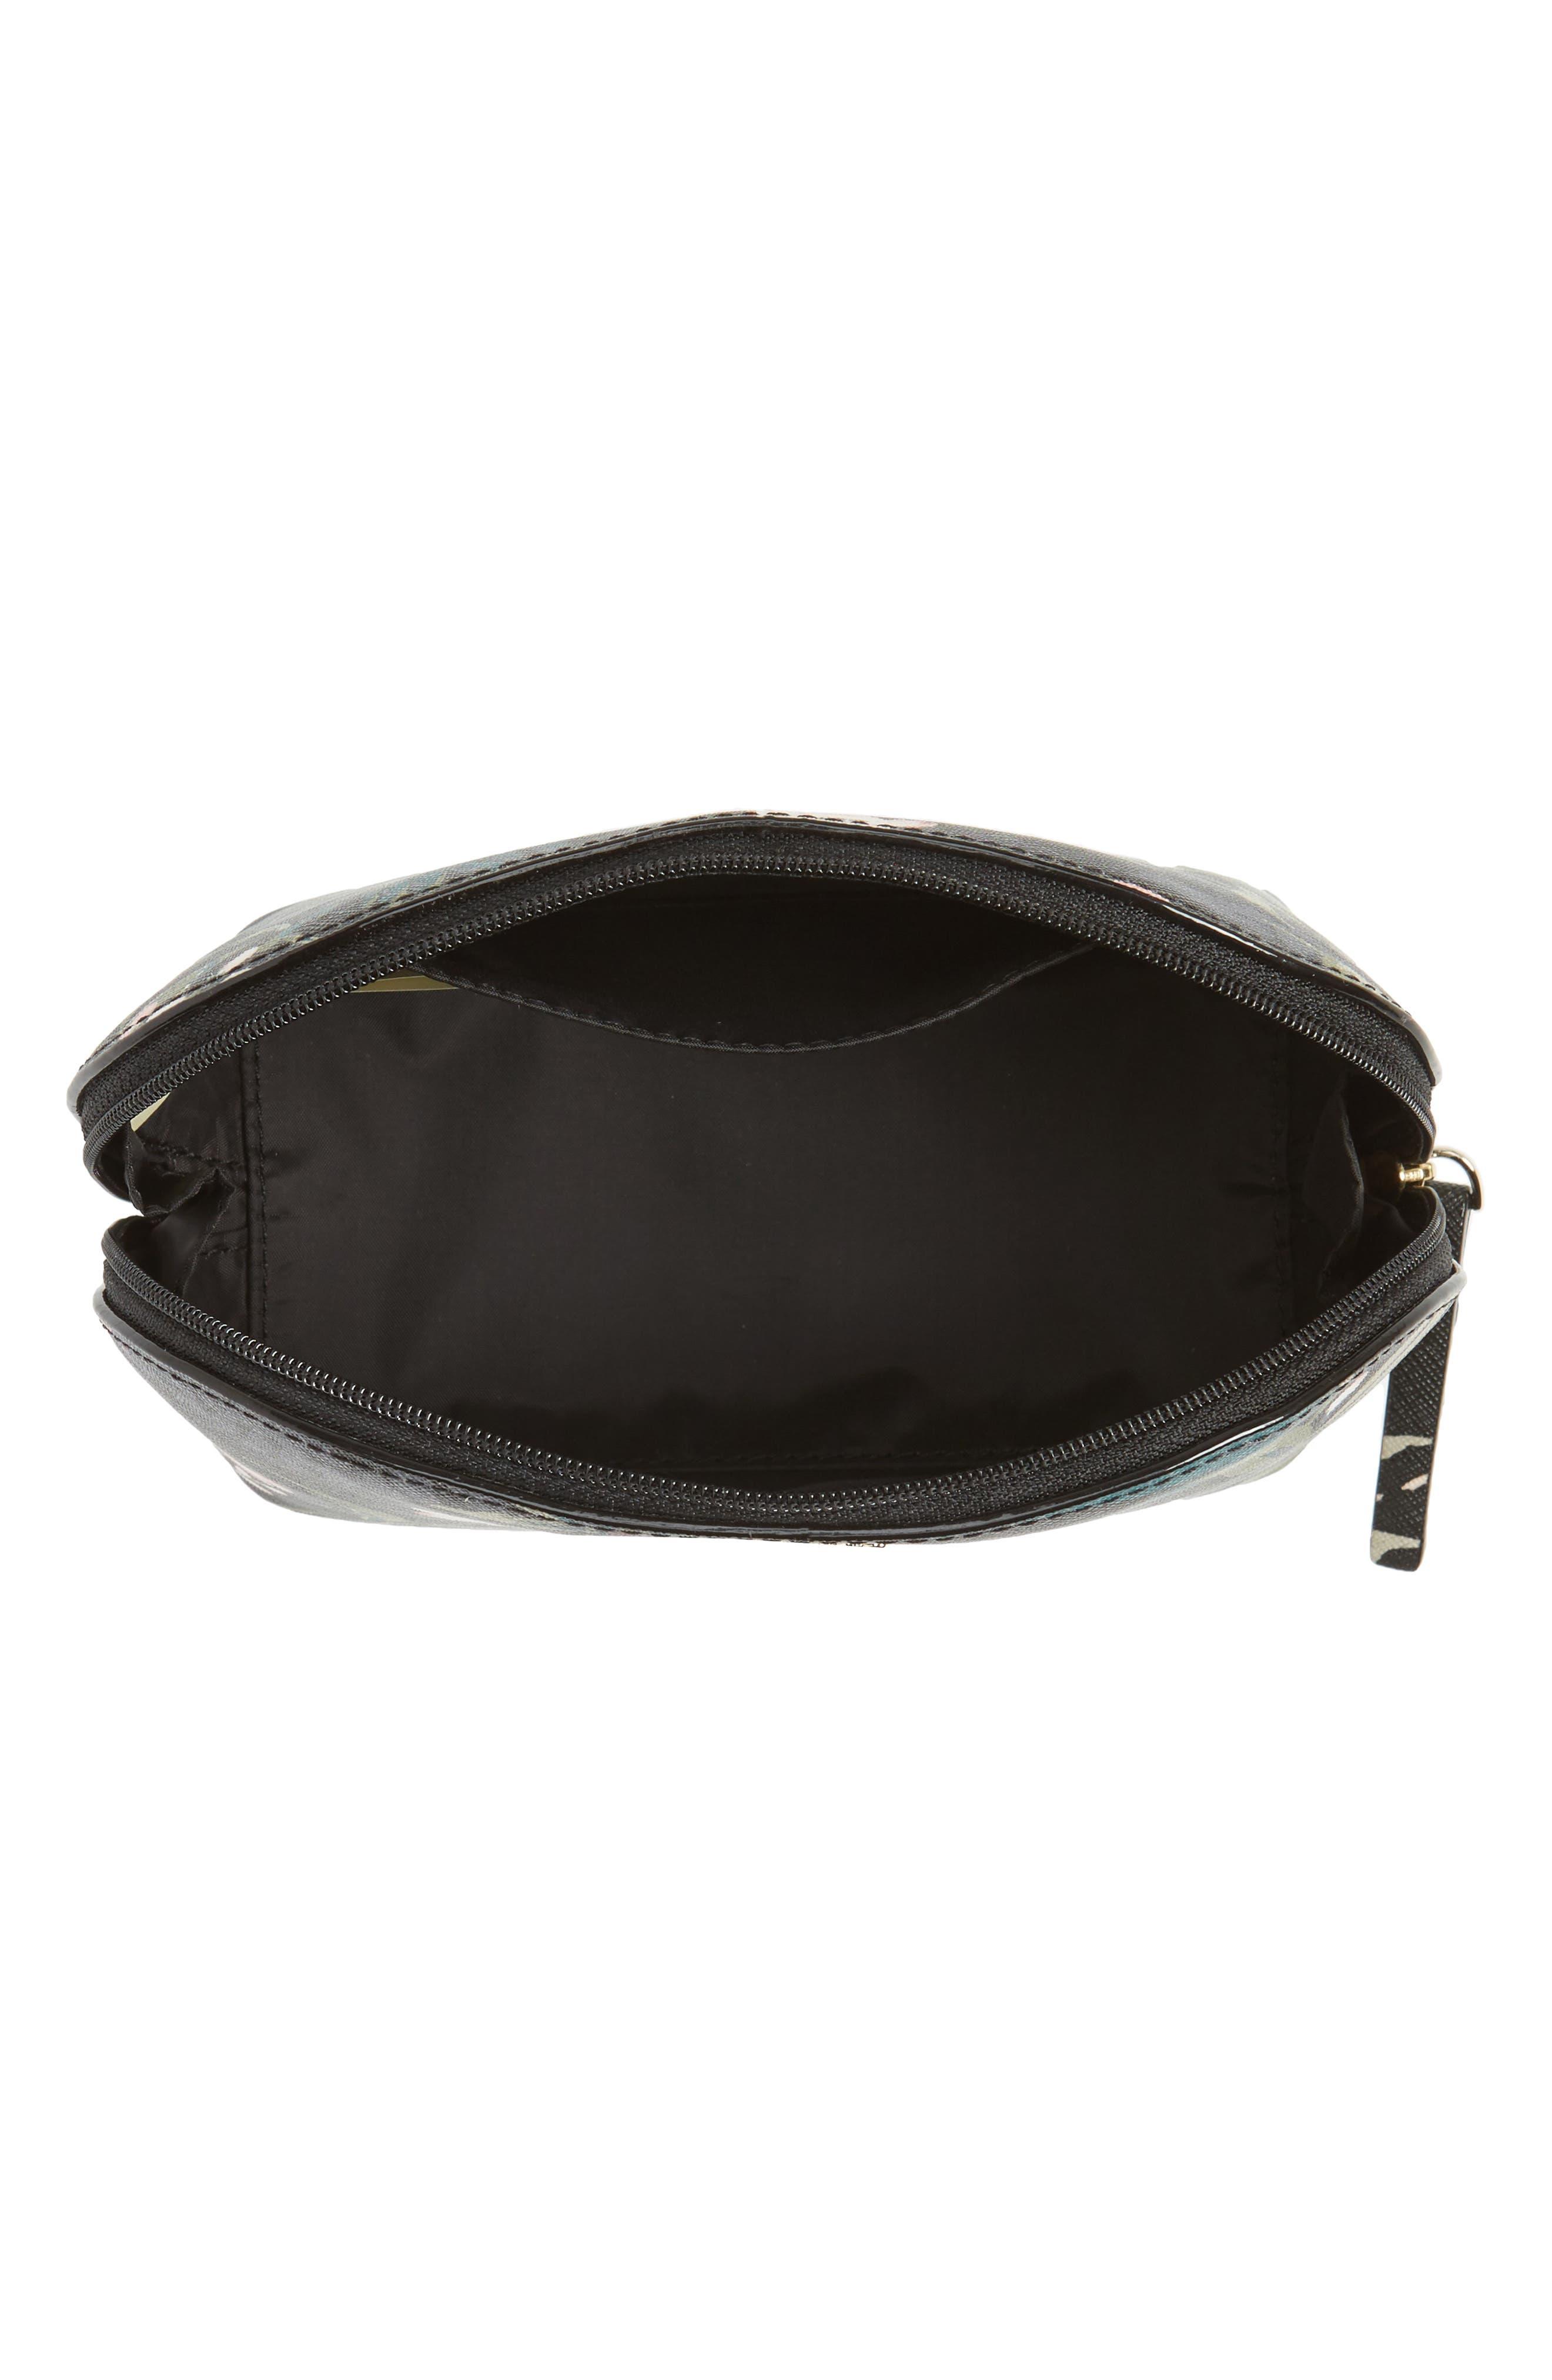 cameron street - small botanical abalene faux leather cosmetics case,                             Alternate thumbnail 3, color,                             Black Multi